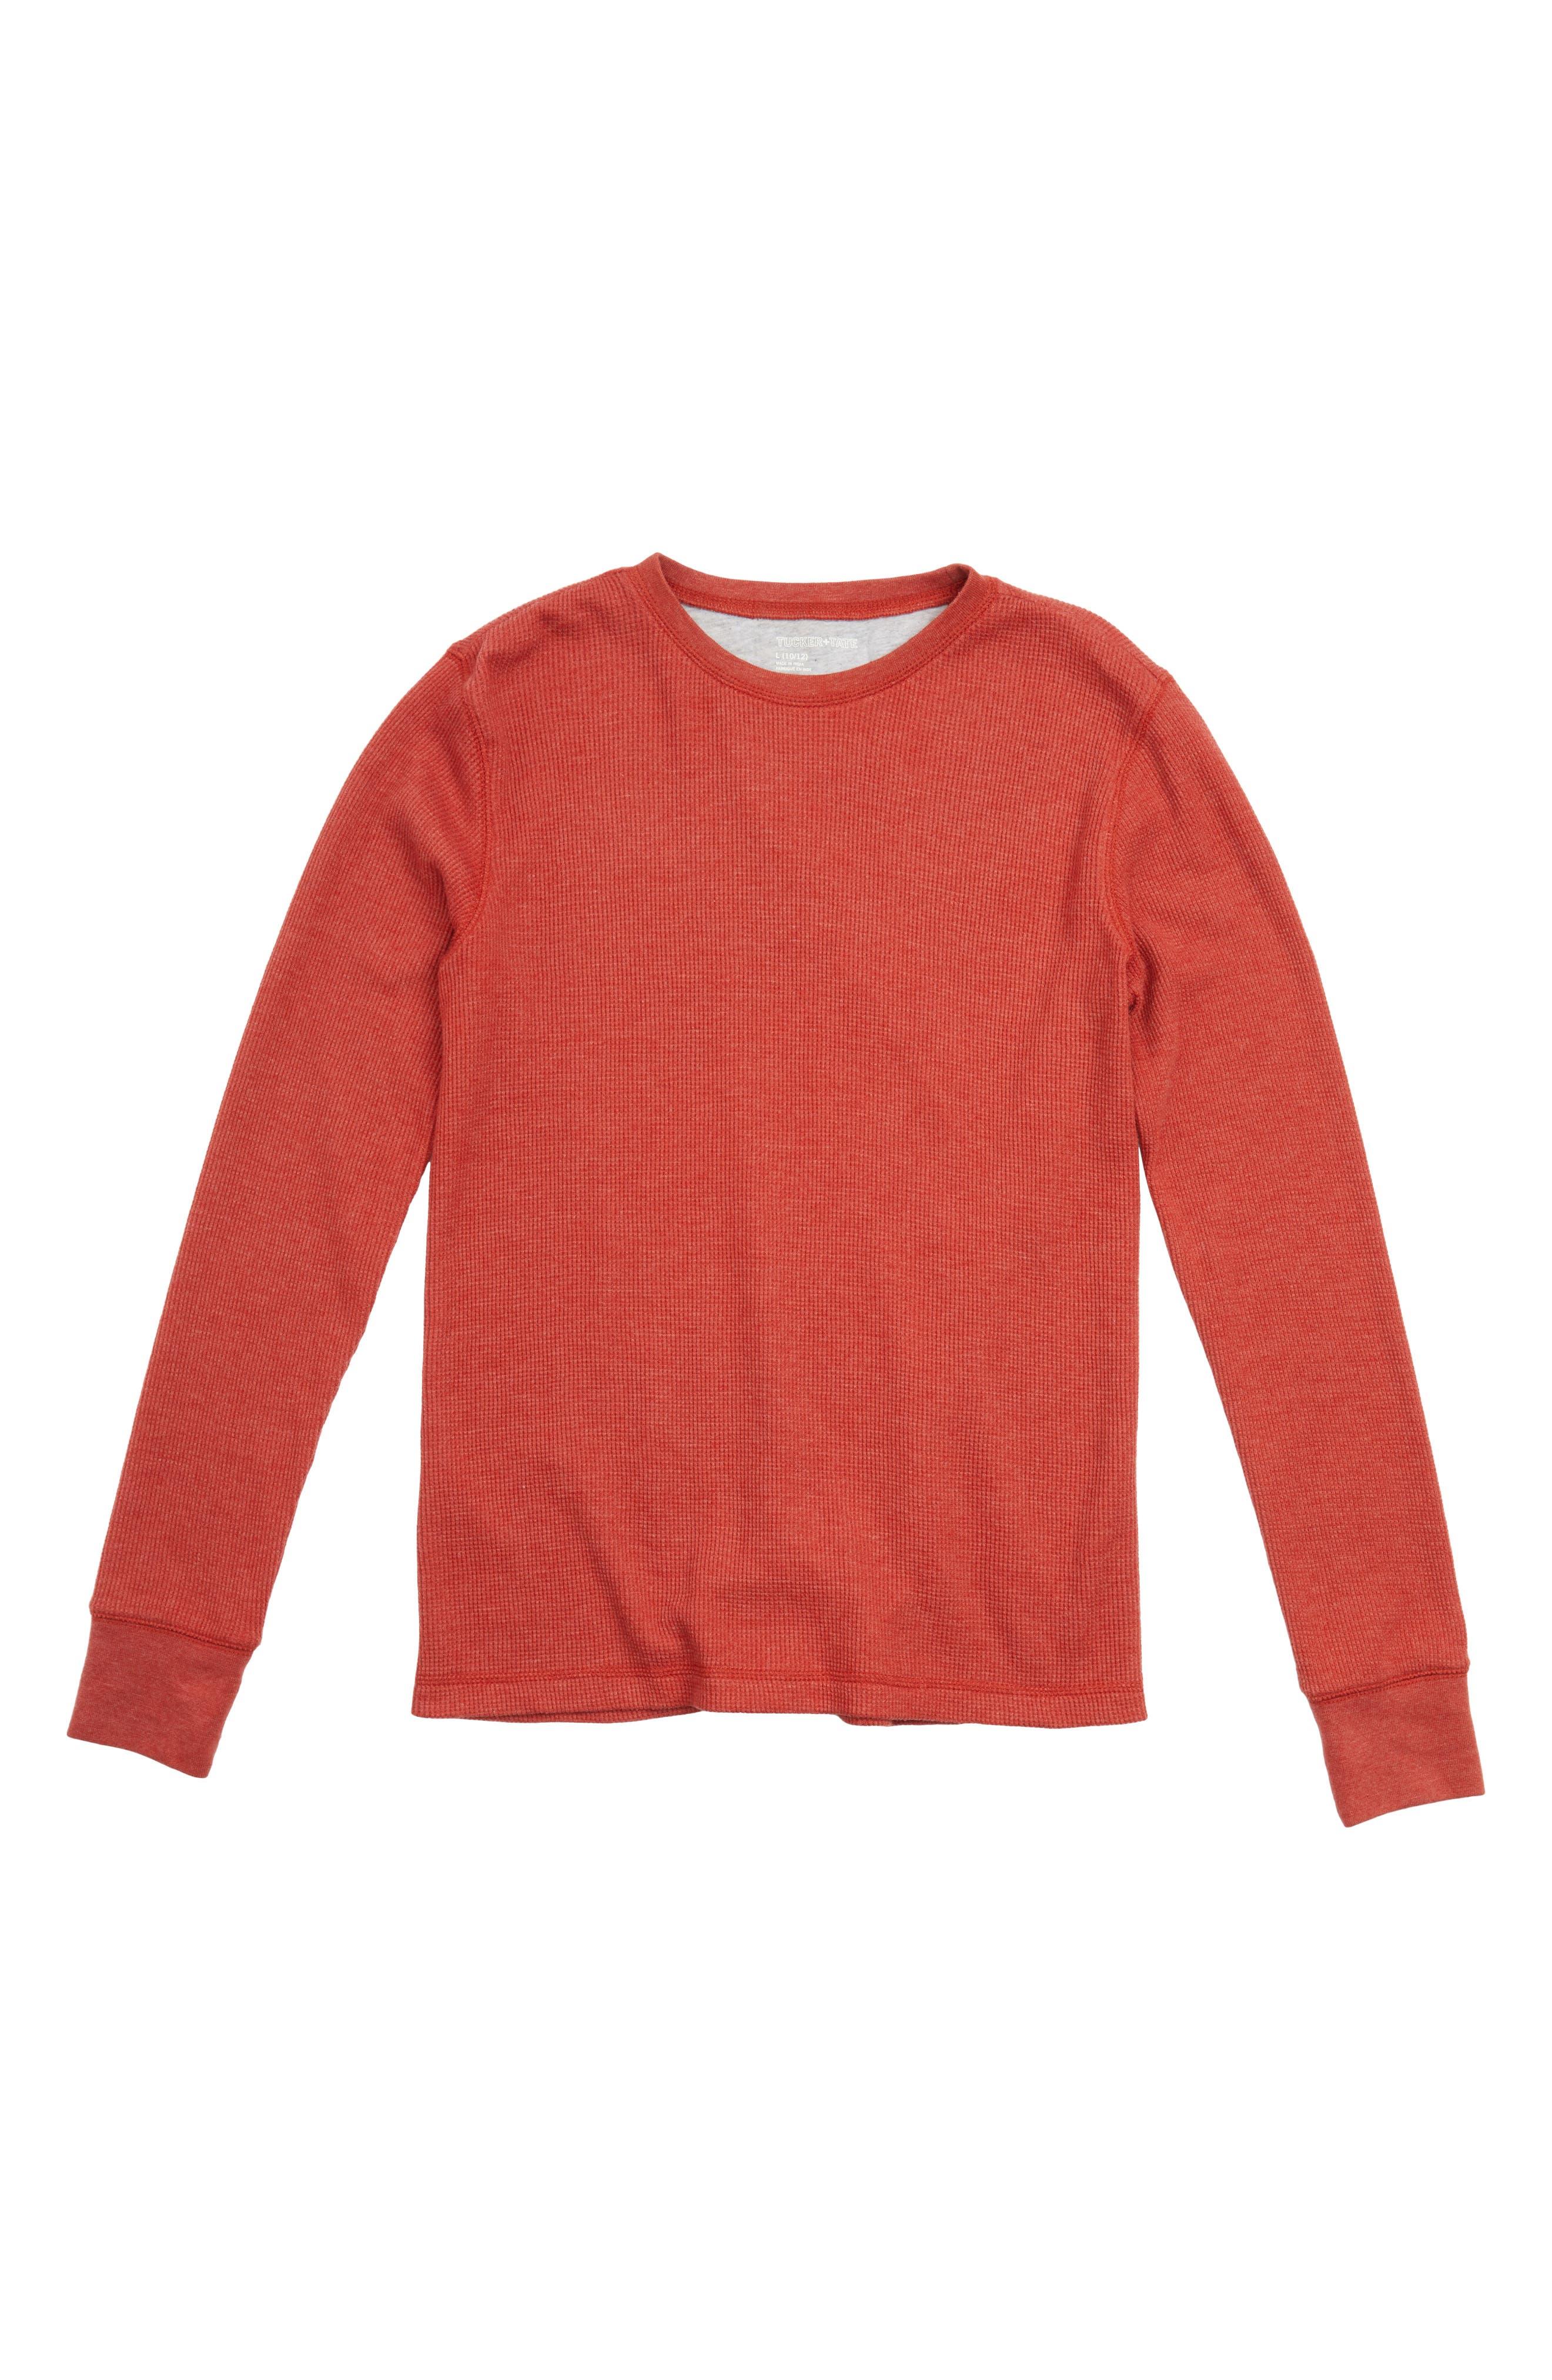 Tucker + Tate Long Sleeve Thermal T-Shirt (Big Boys)